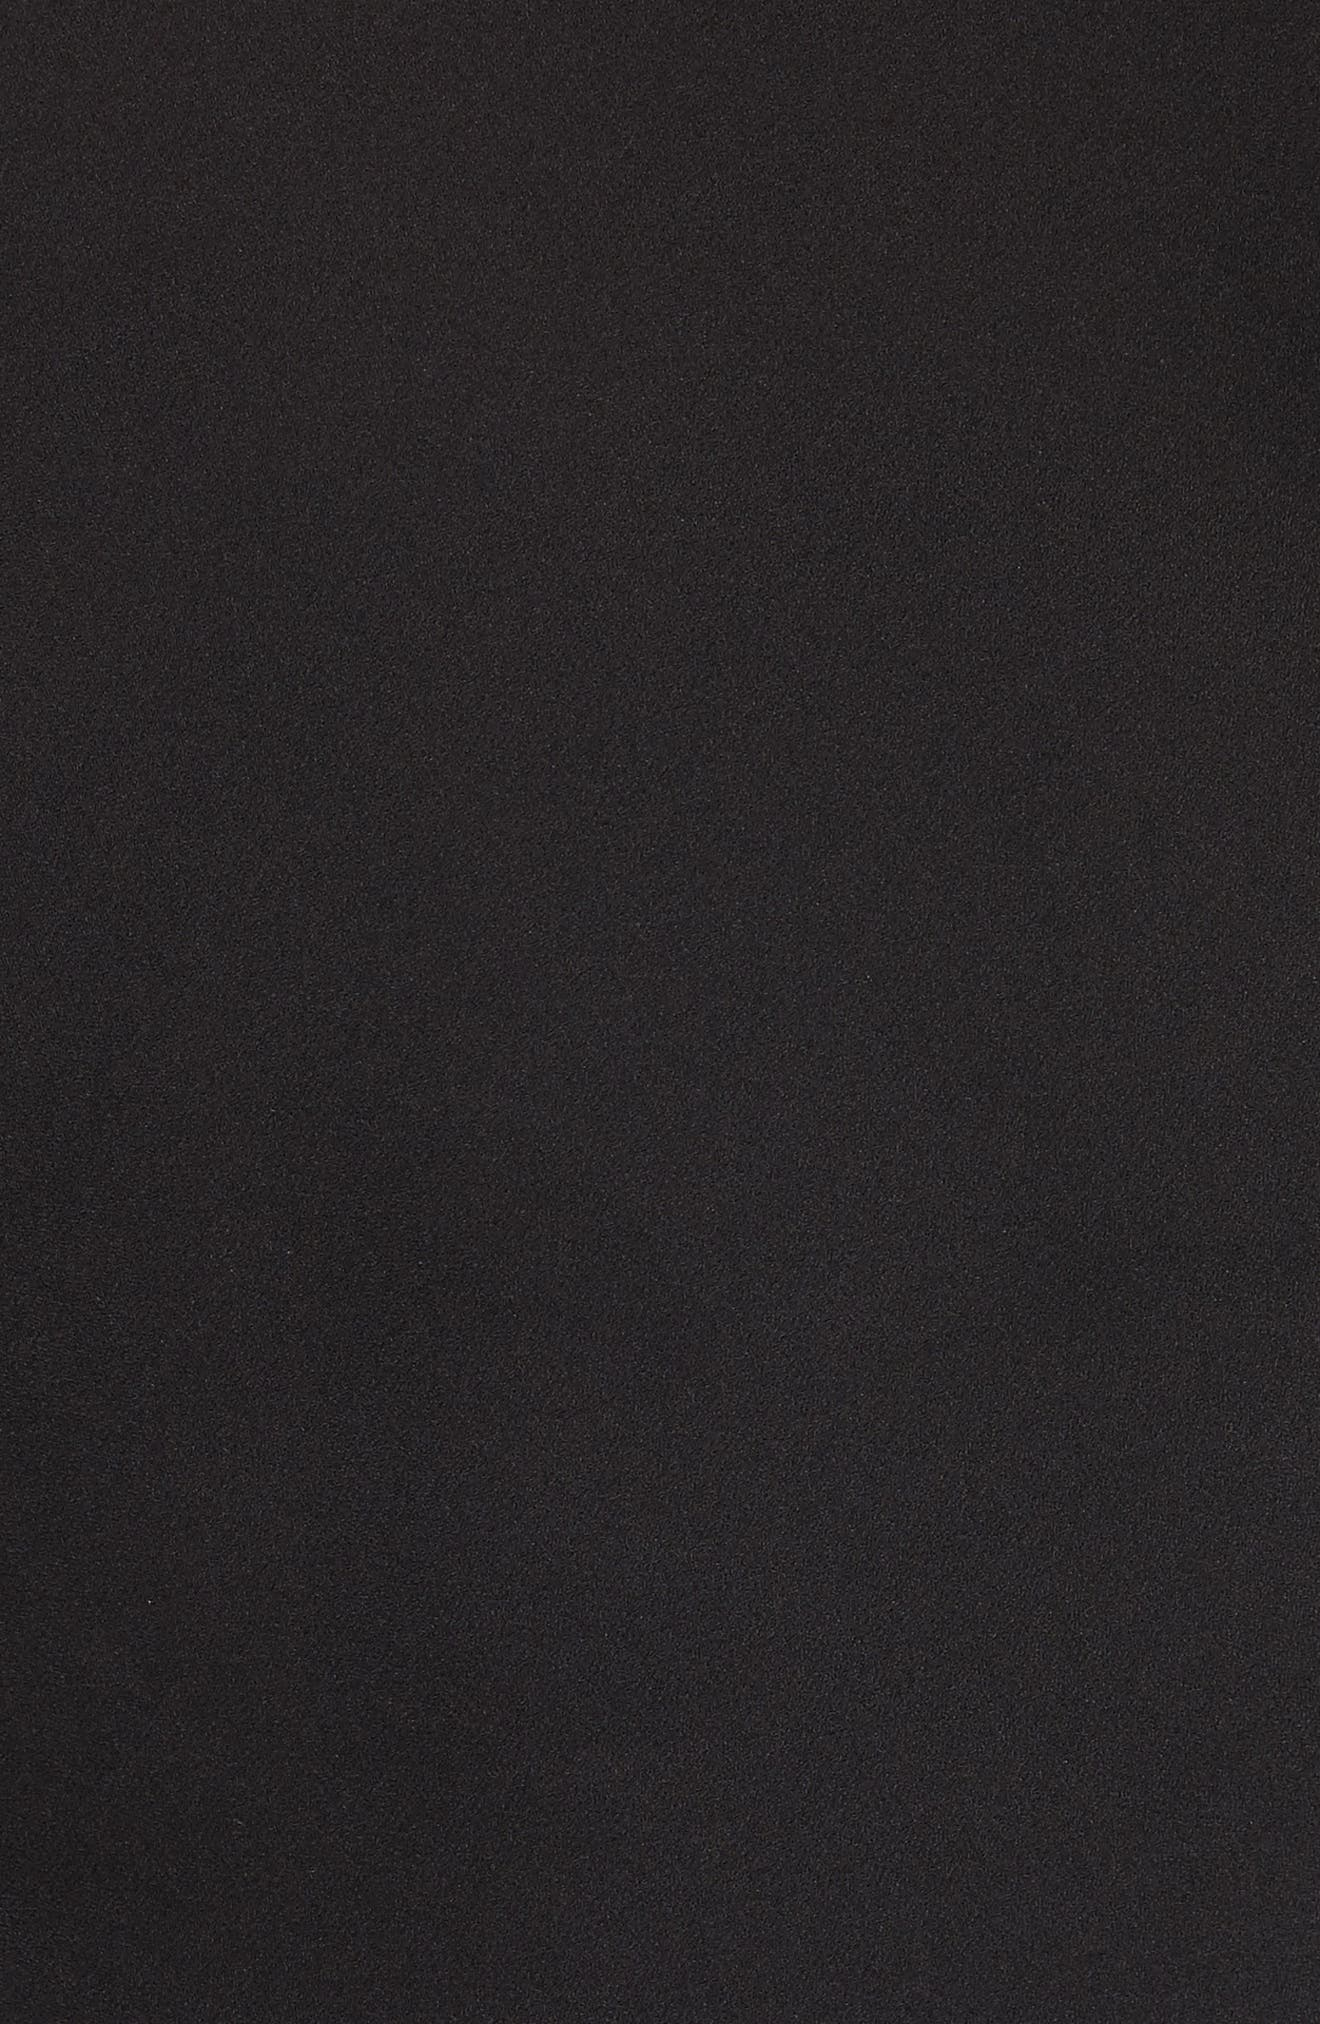 Ruffle Edge Silk Dress,                             Alternate thumbnail 5, color,                             001